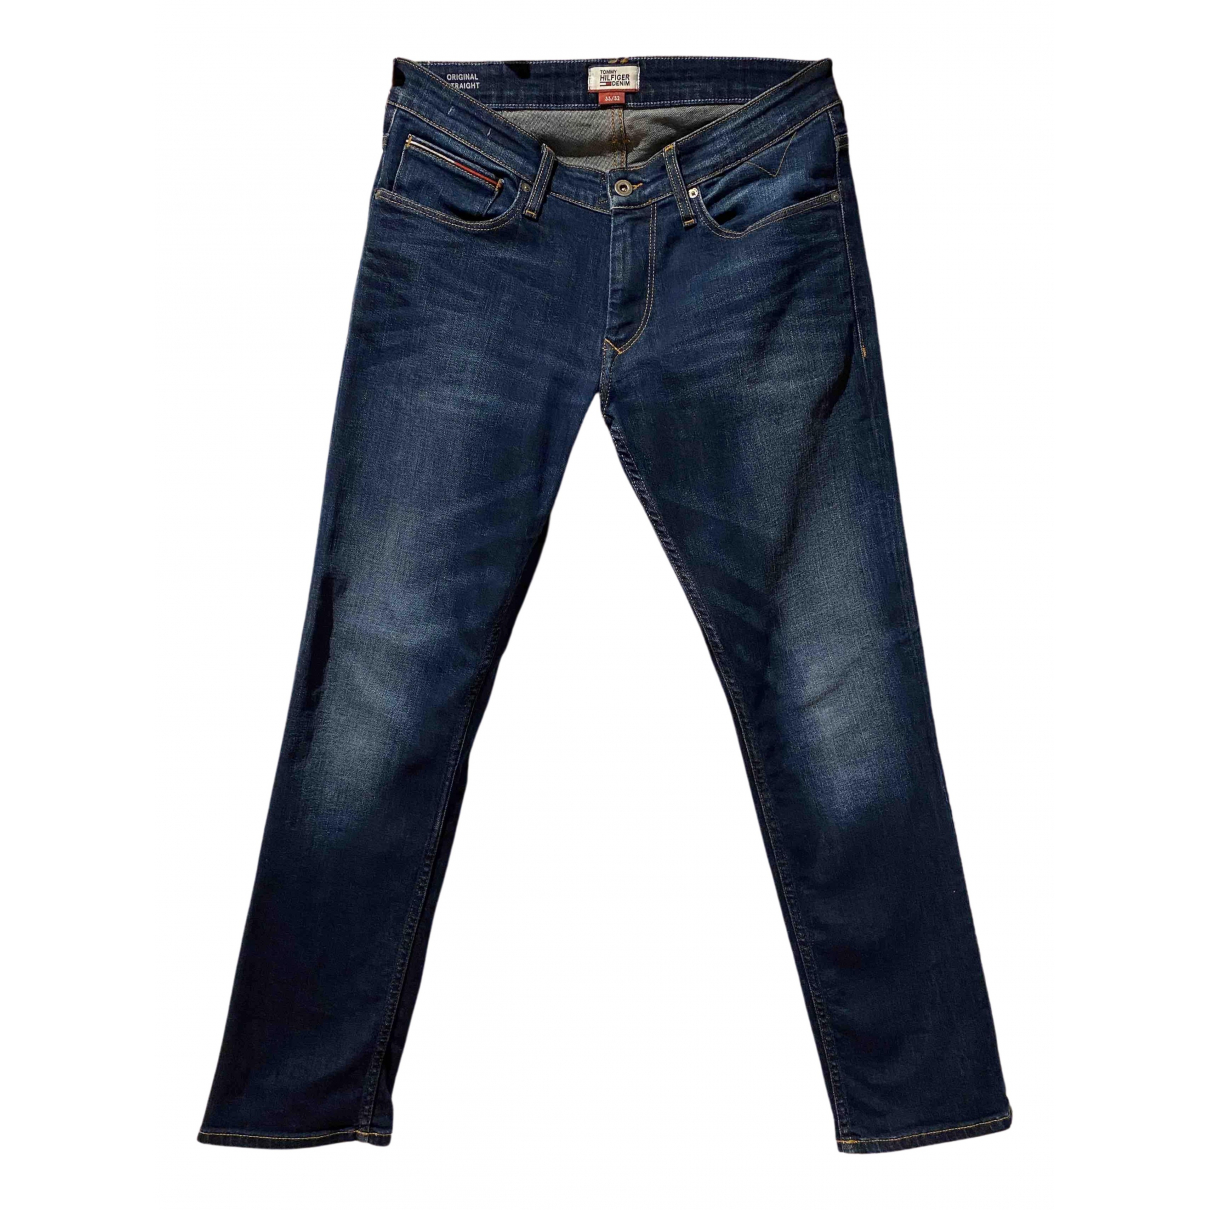 Tommy Hilfiger \N Blue Denim - Jeans Trousers for Men M International